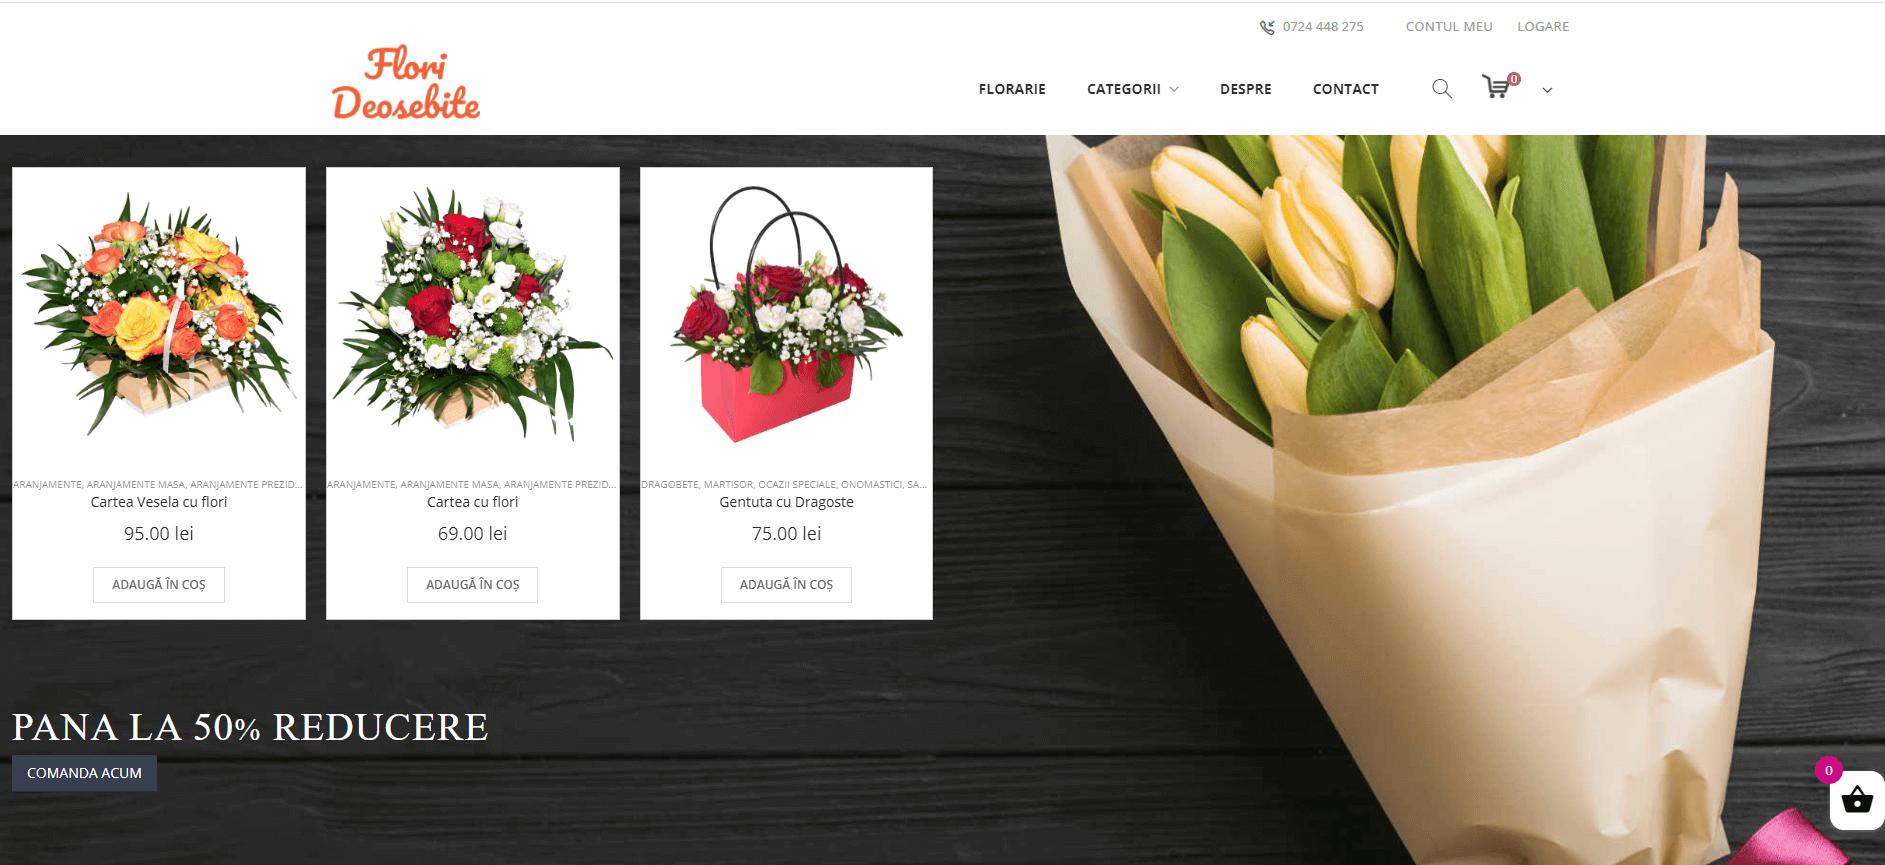 Portofoliu Magazin Online Flori - Home Page